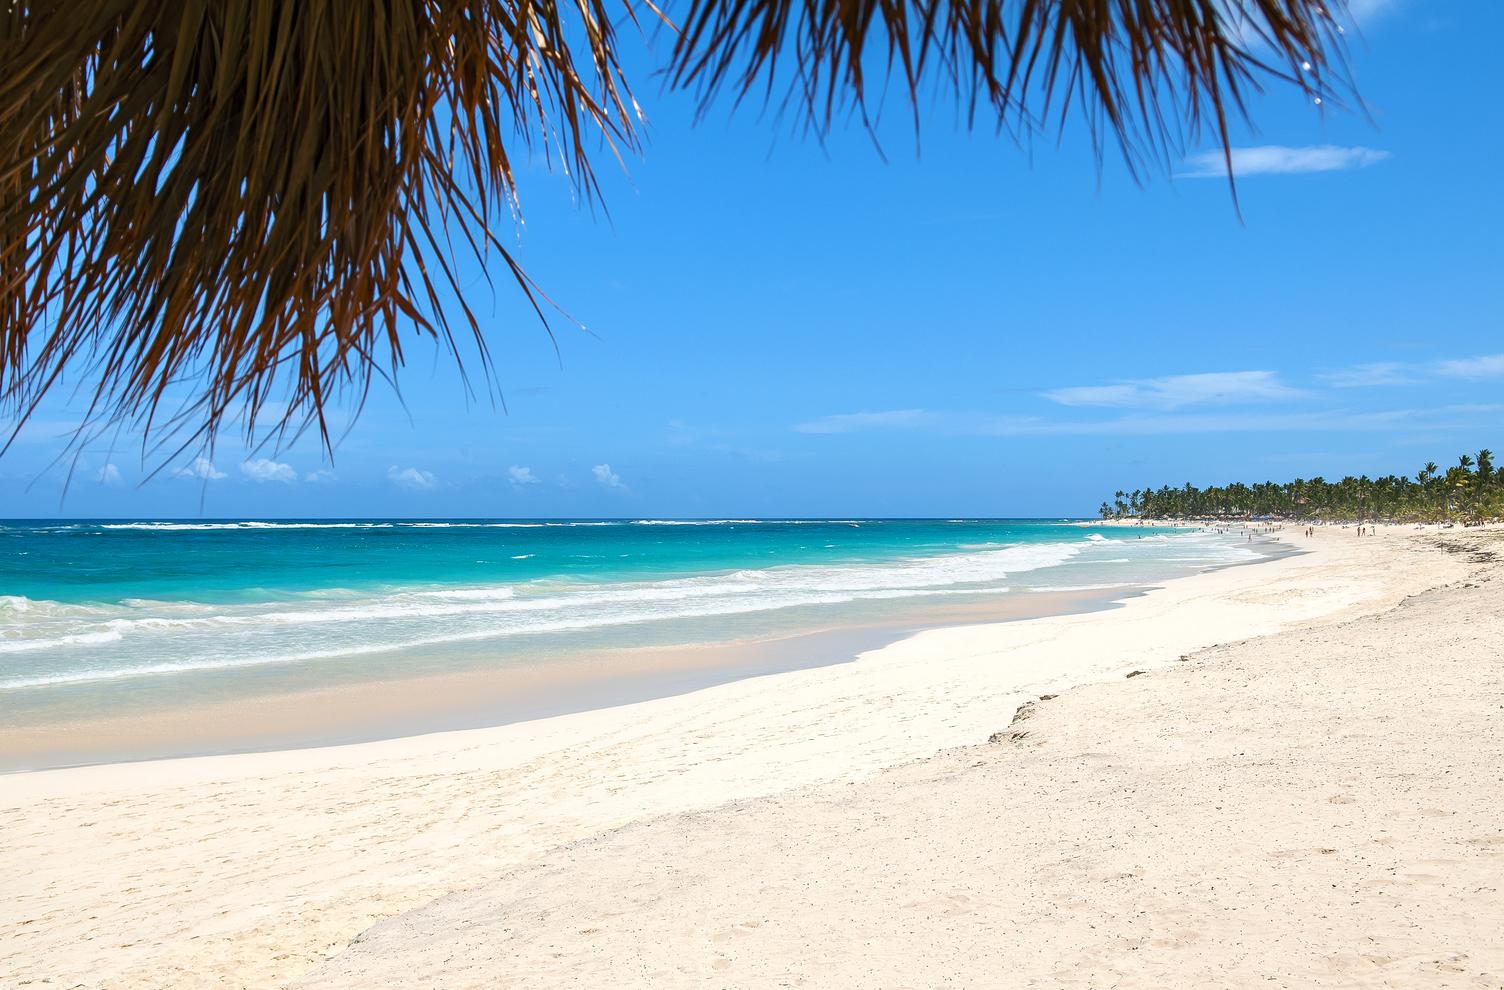 HRH Punta Cana Beach 5745 042513.jpg